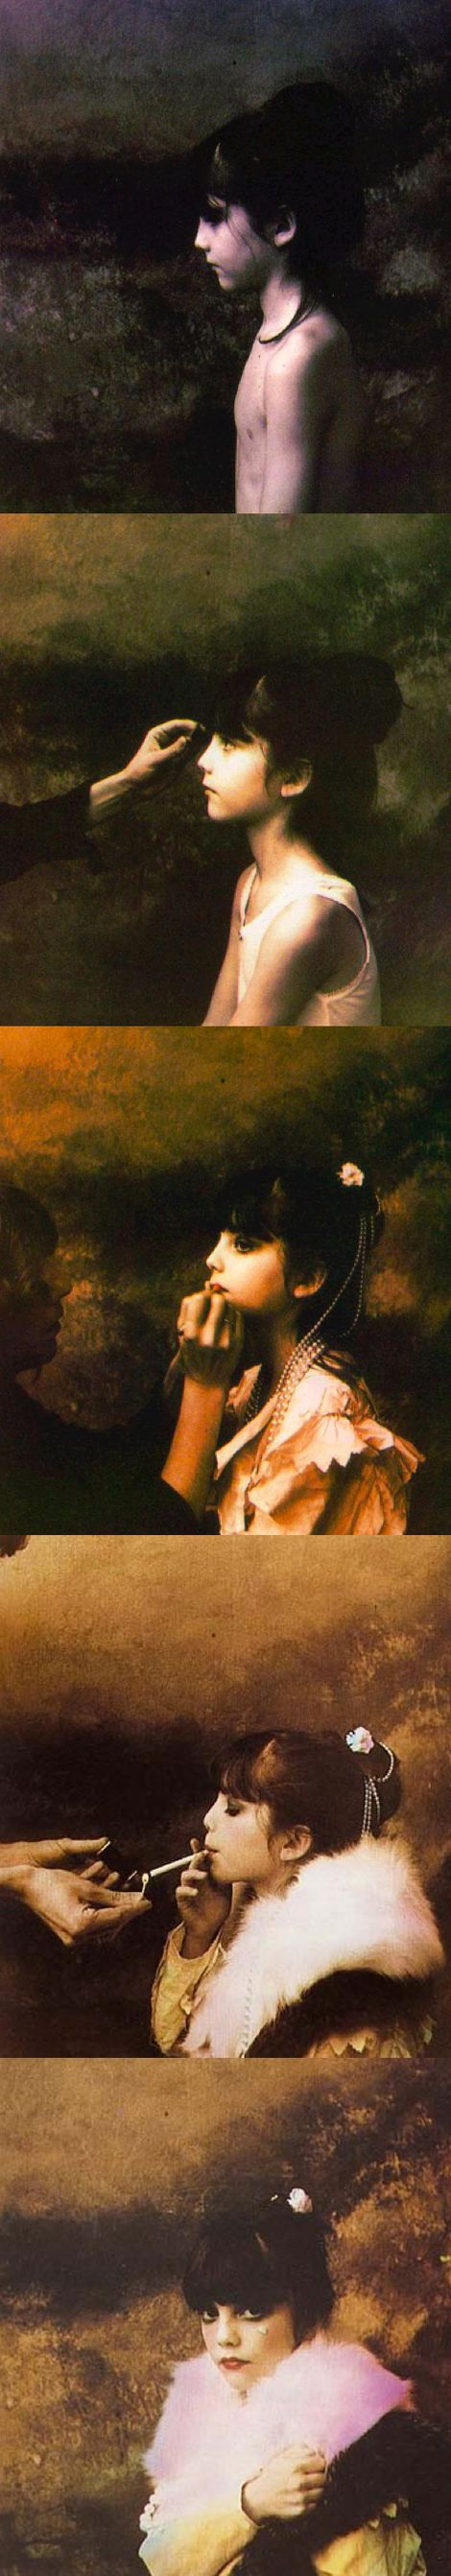 Jan Saudek - Little Ilaria's Makeup